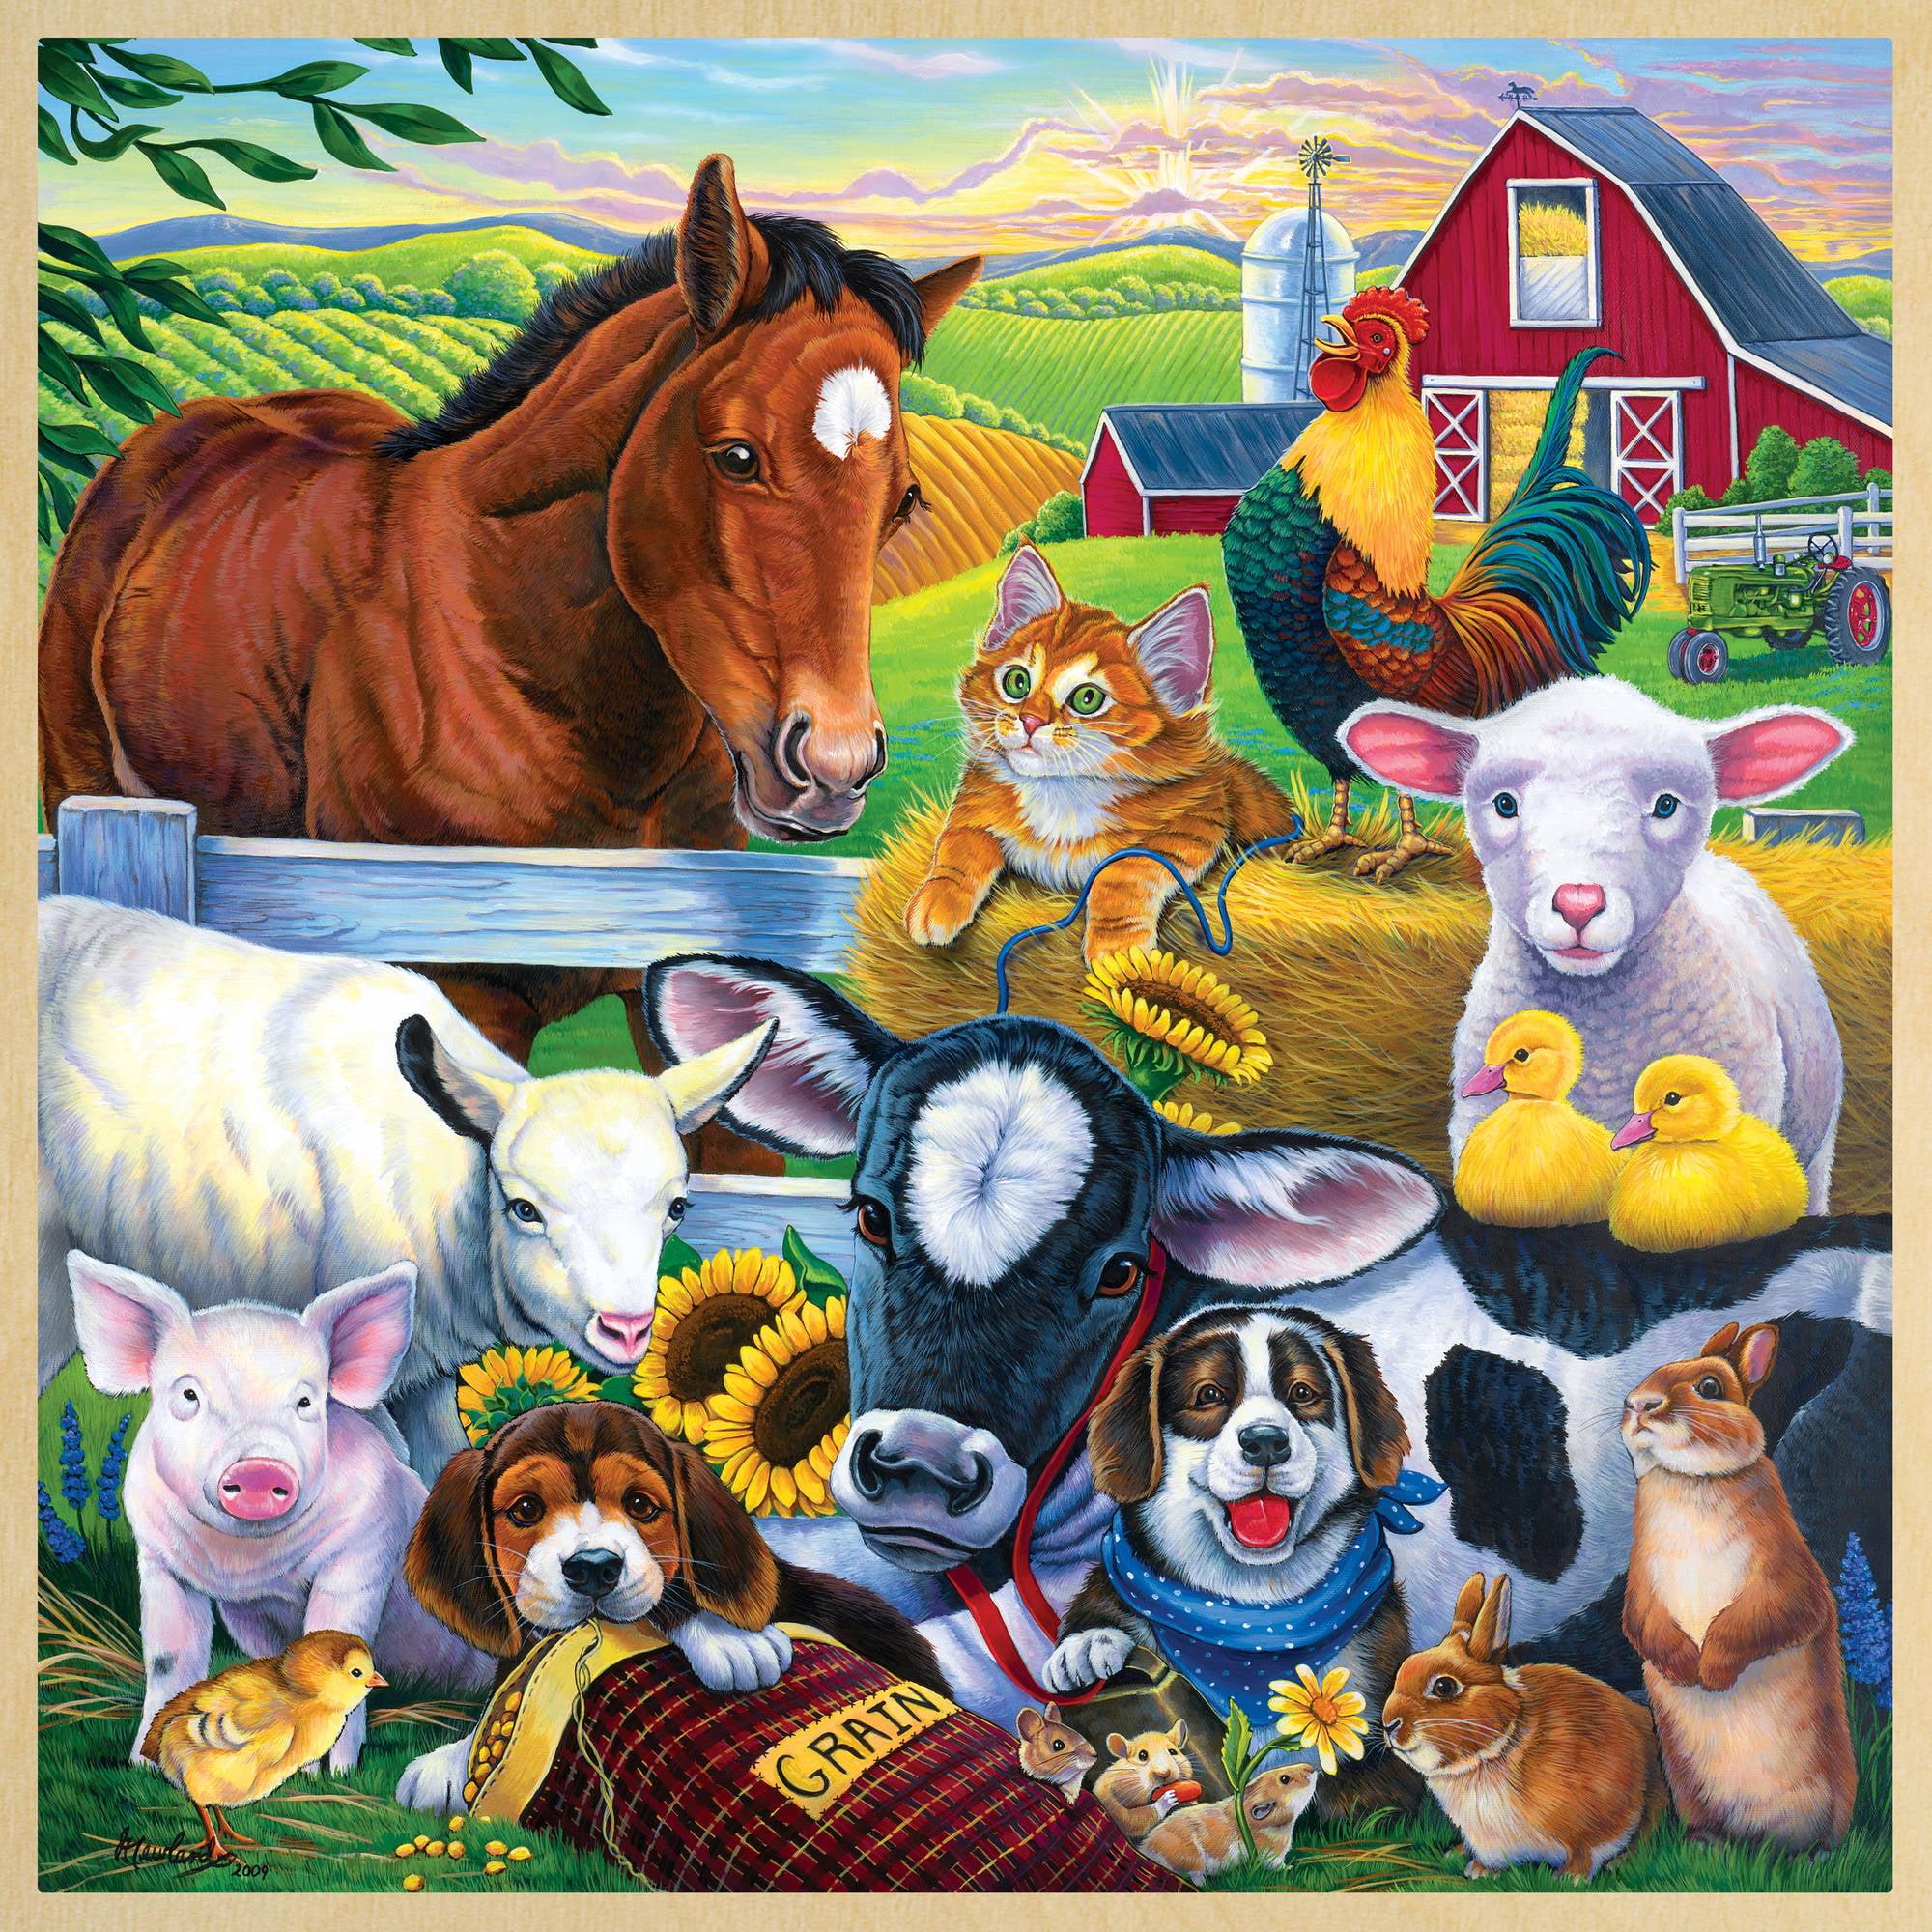 MasterPieces Farm Friends 48 Piece Puzzle by MasterPieces Puzzle Company